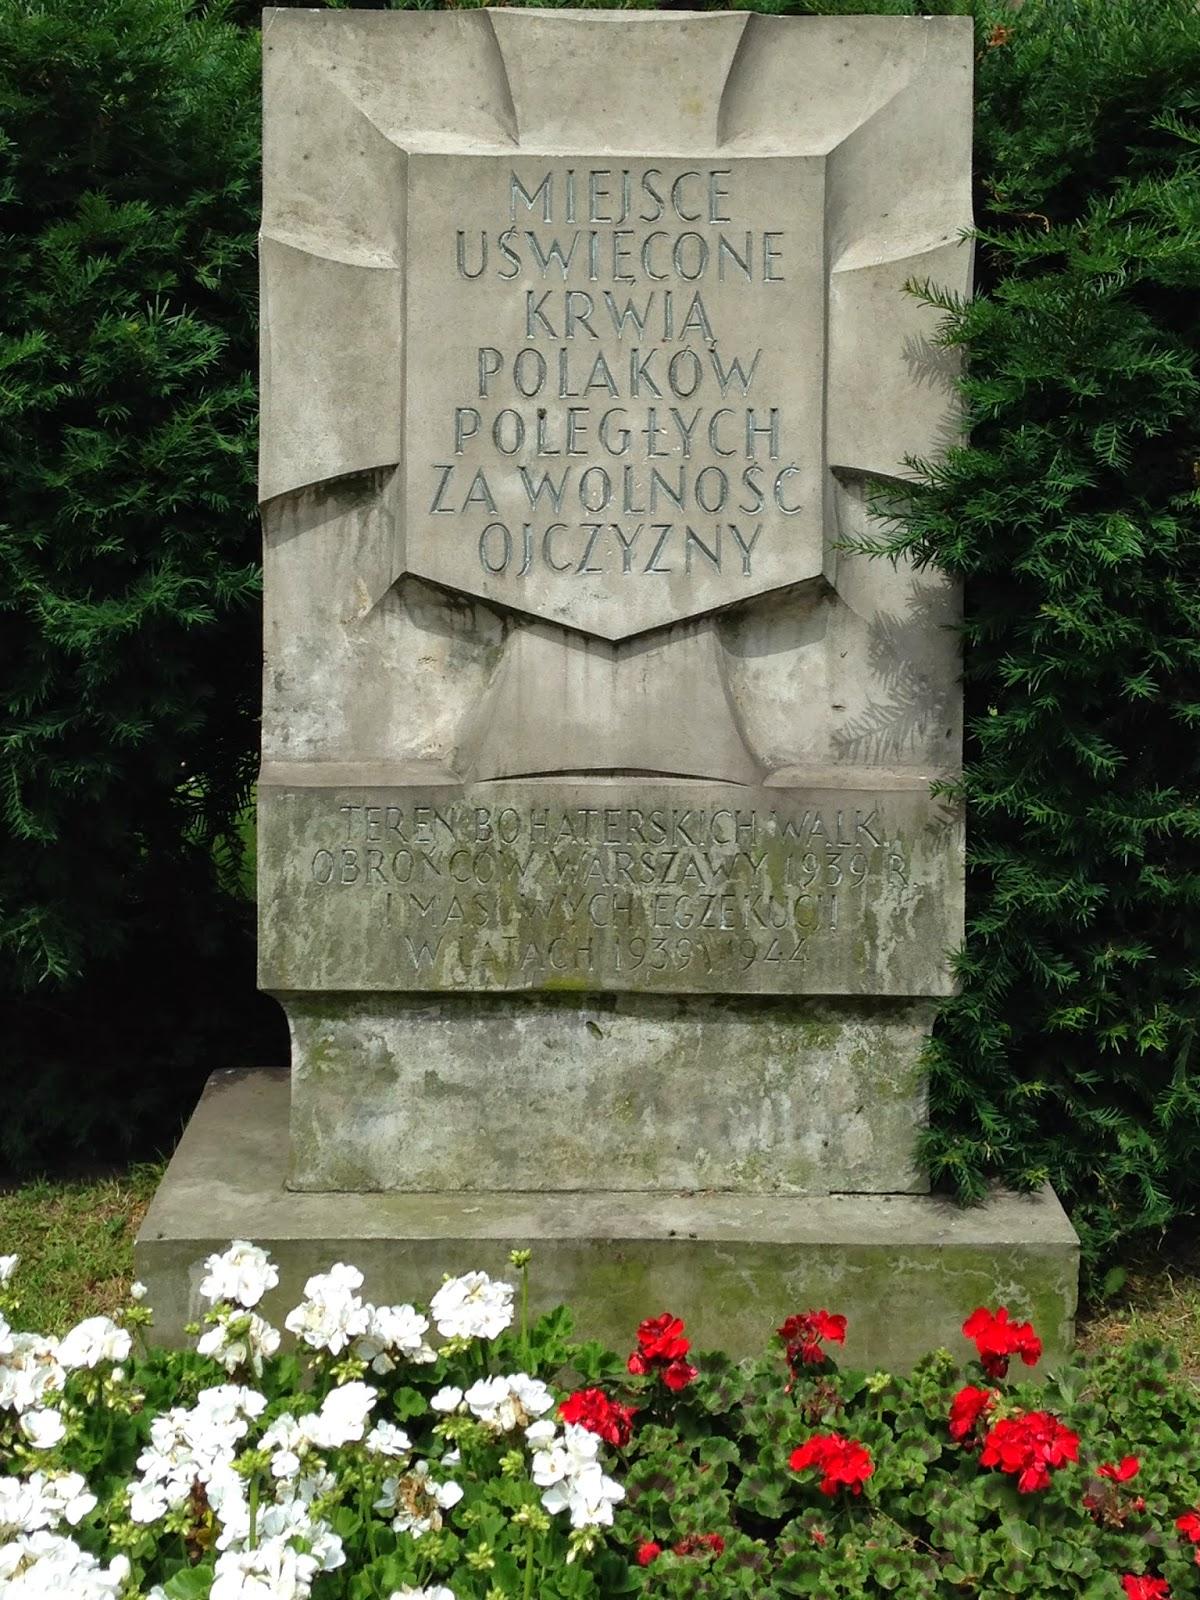 Historical marker of a Nazi massacre of civilian Poles, by Maja Trochimczyk